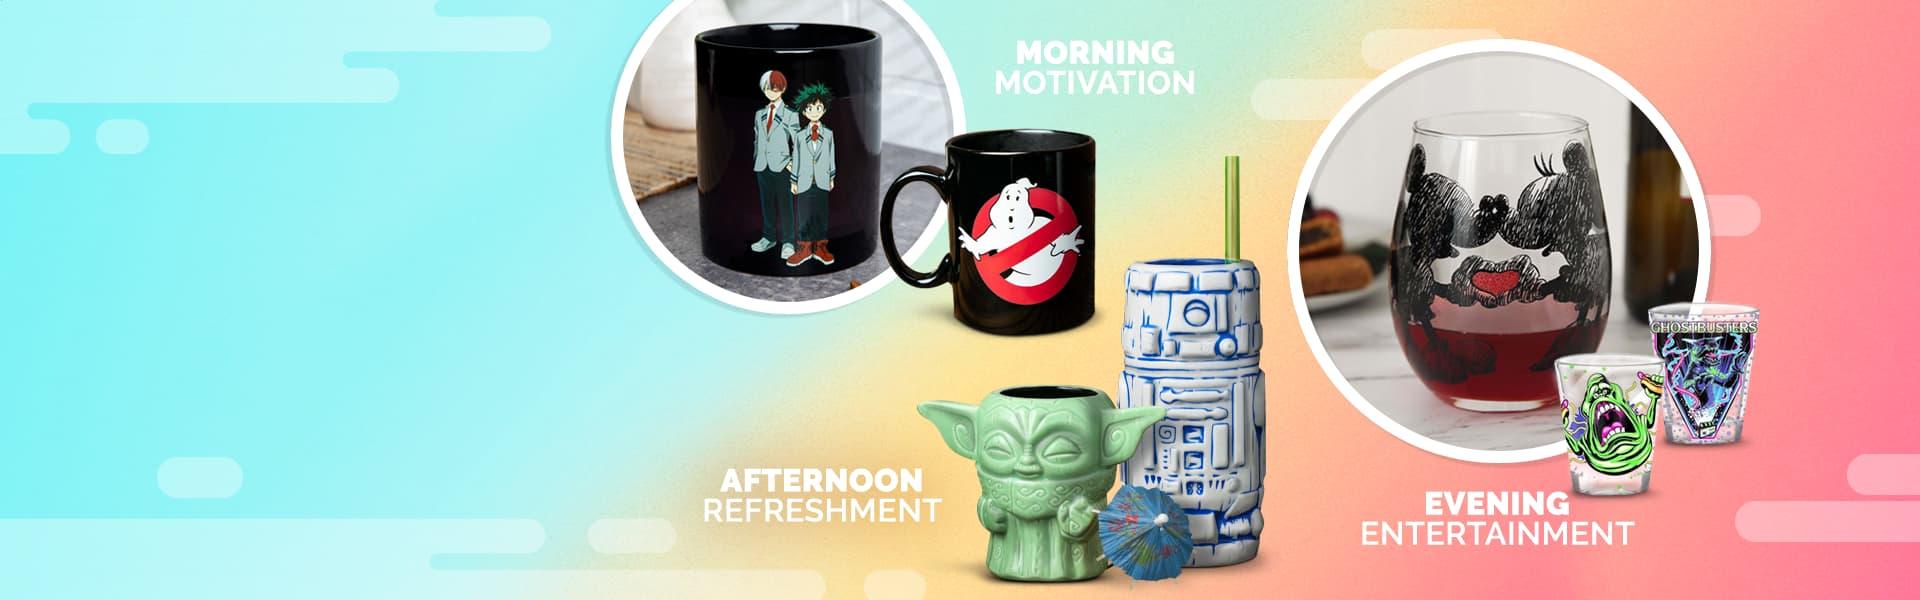 Drinkware: Mugs, Water Bottles, Glasses